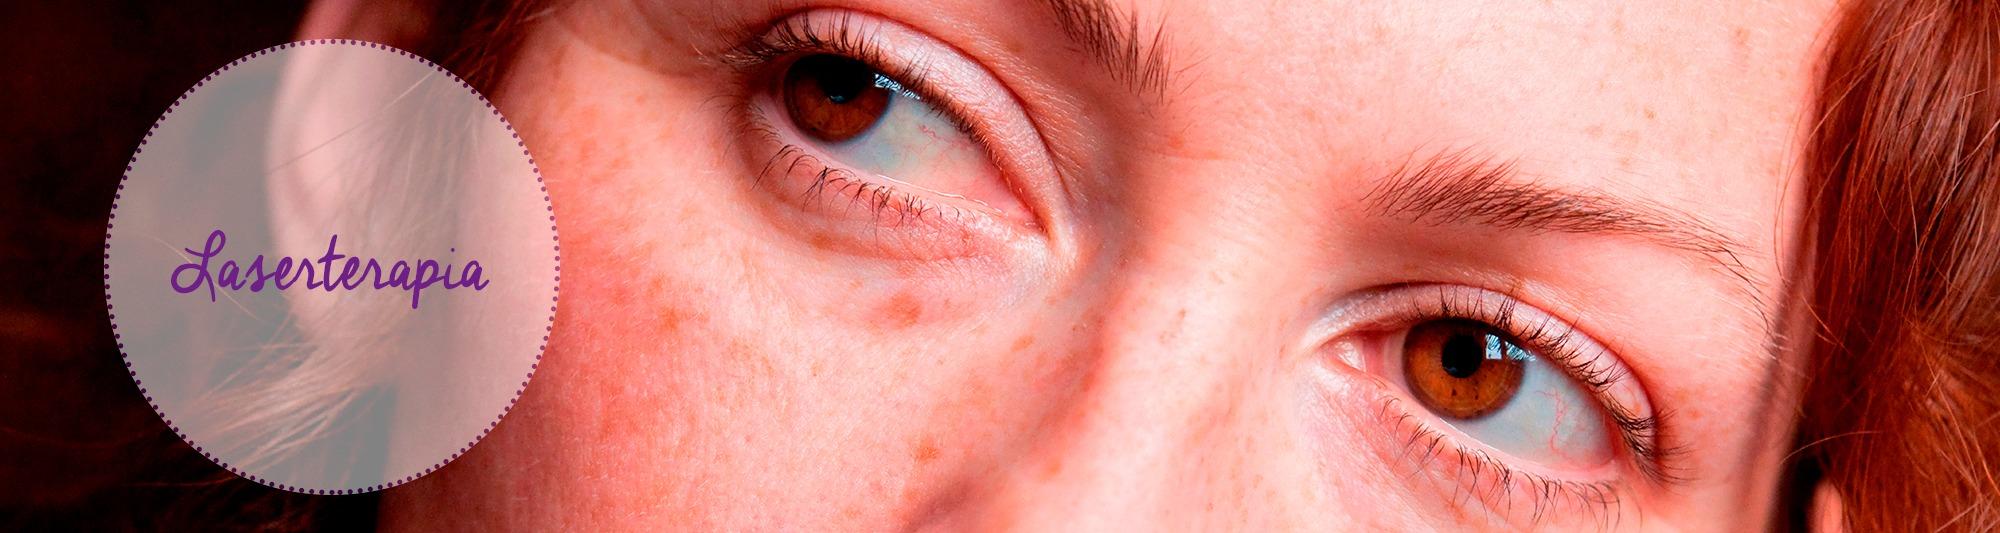 laserterapia, reumatologia, acne, cicatrices, andorra,